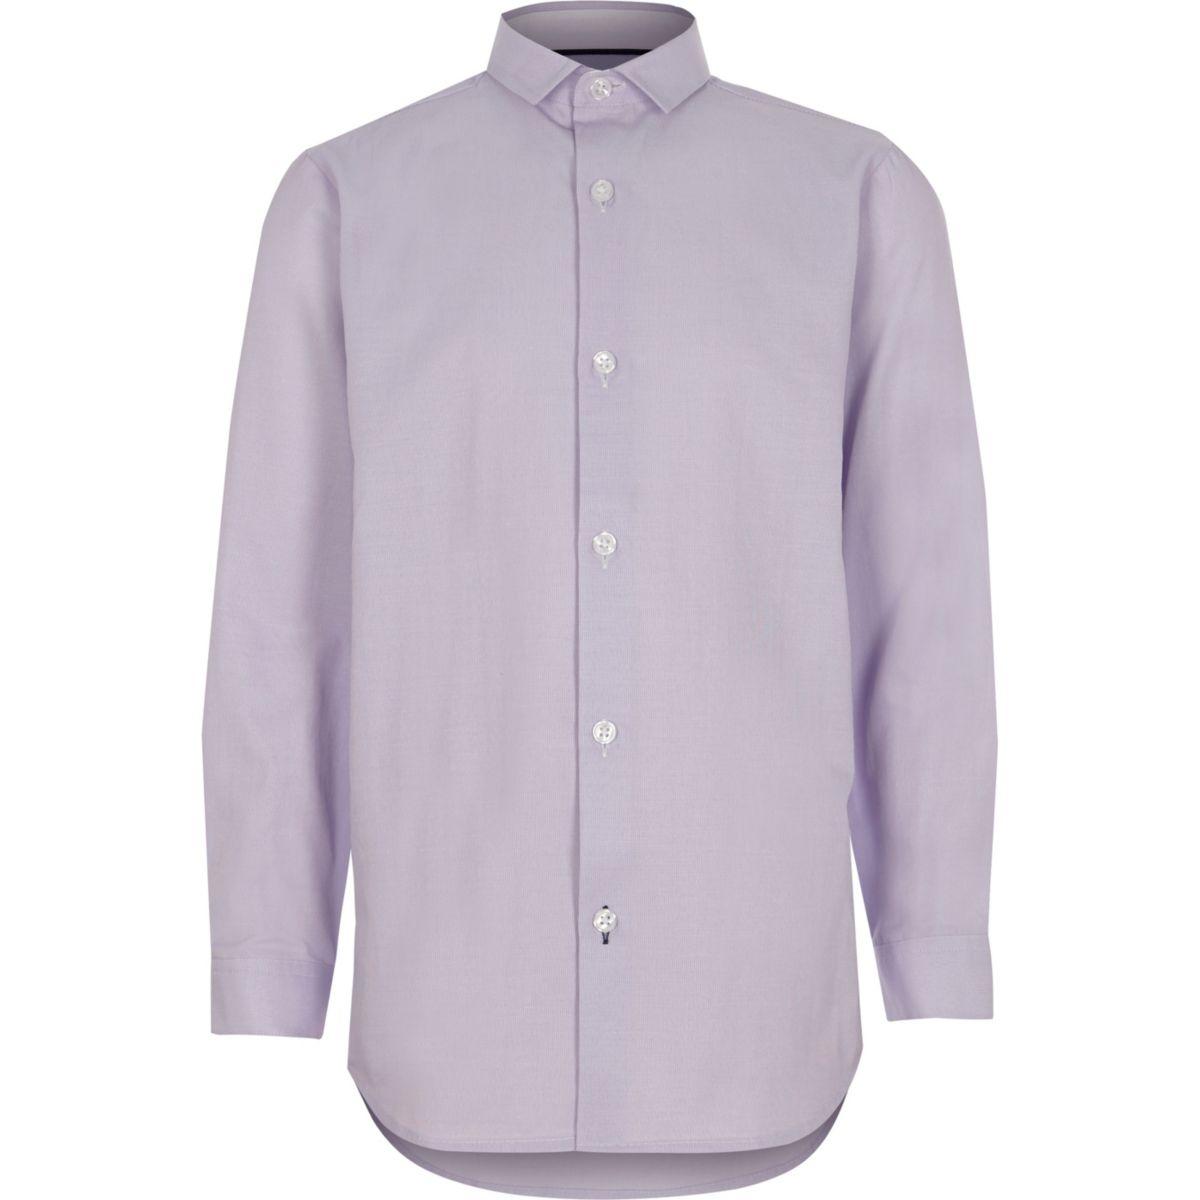 Chemise habillée violet clair garçon